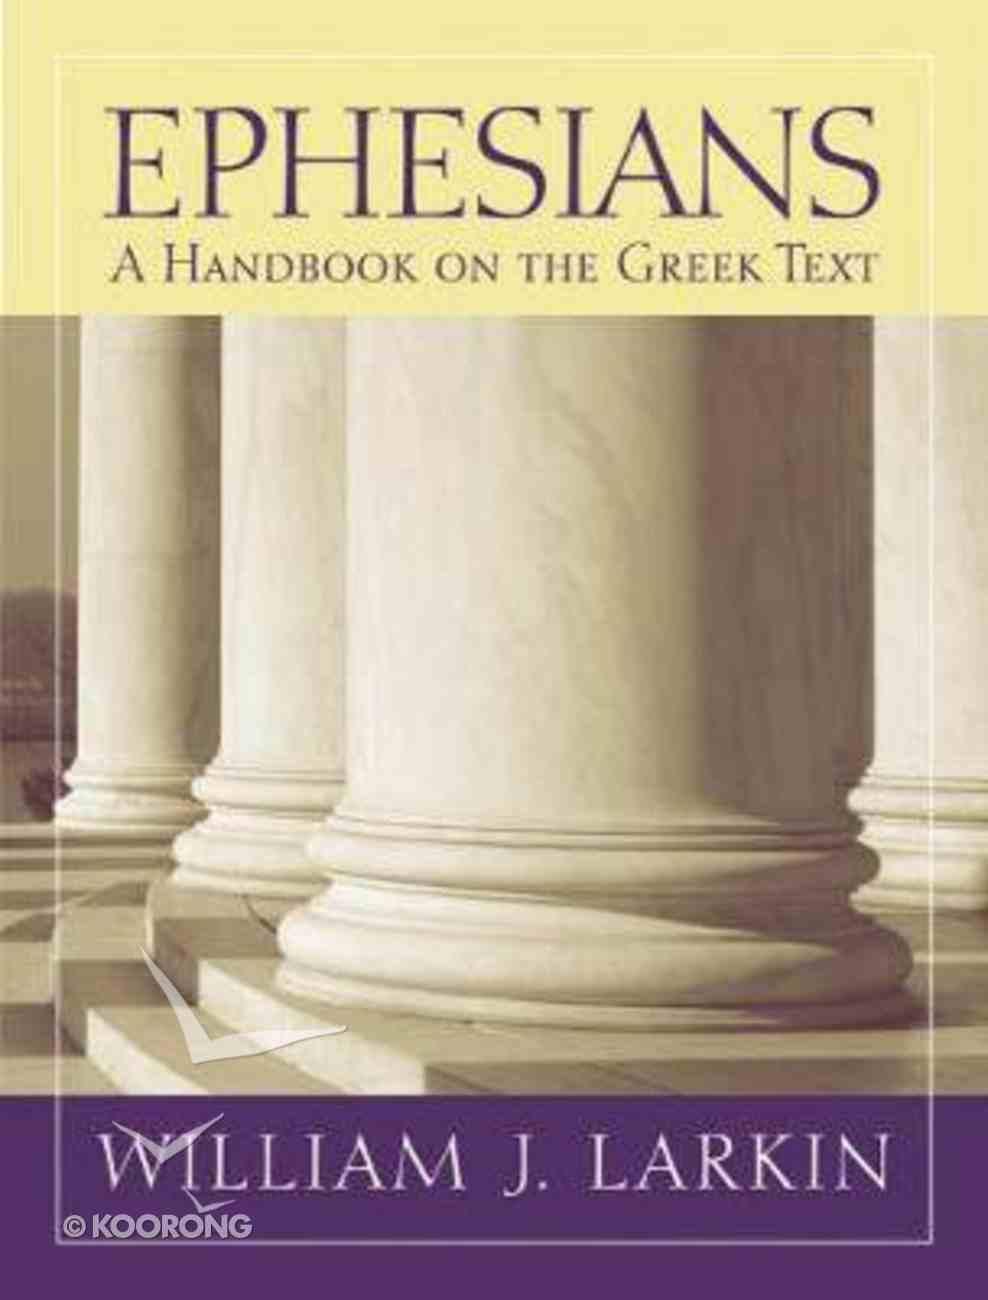 Ephesians a Handbook on the Greek Text (Baylor Handbook On The Greek New Testament Series) Paperback